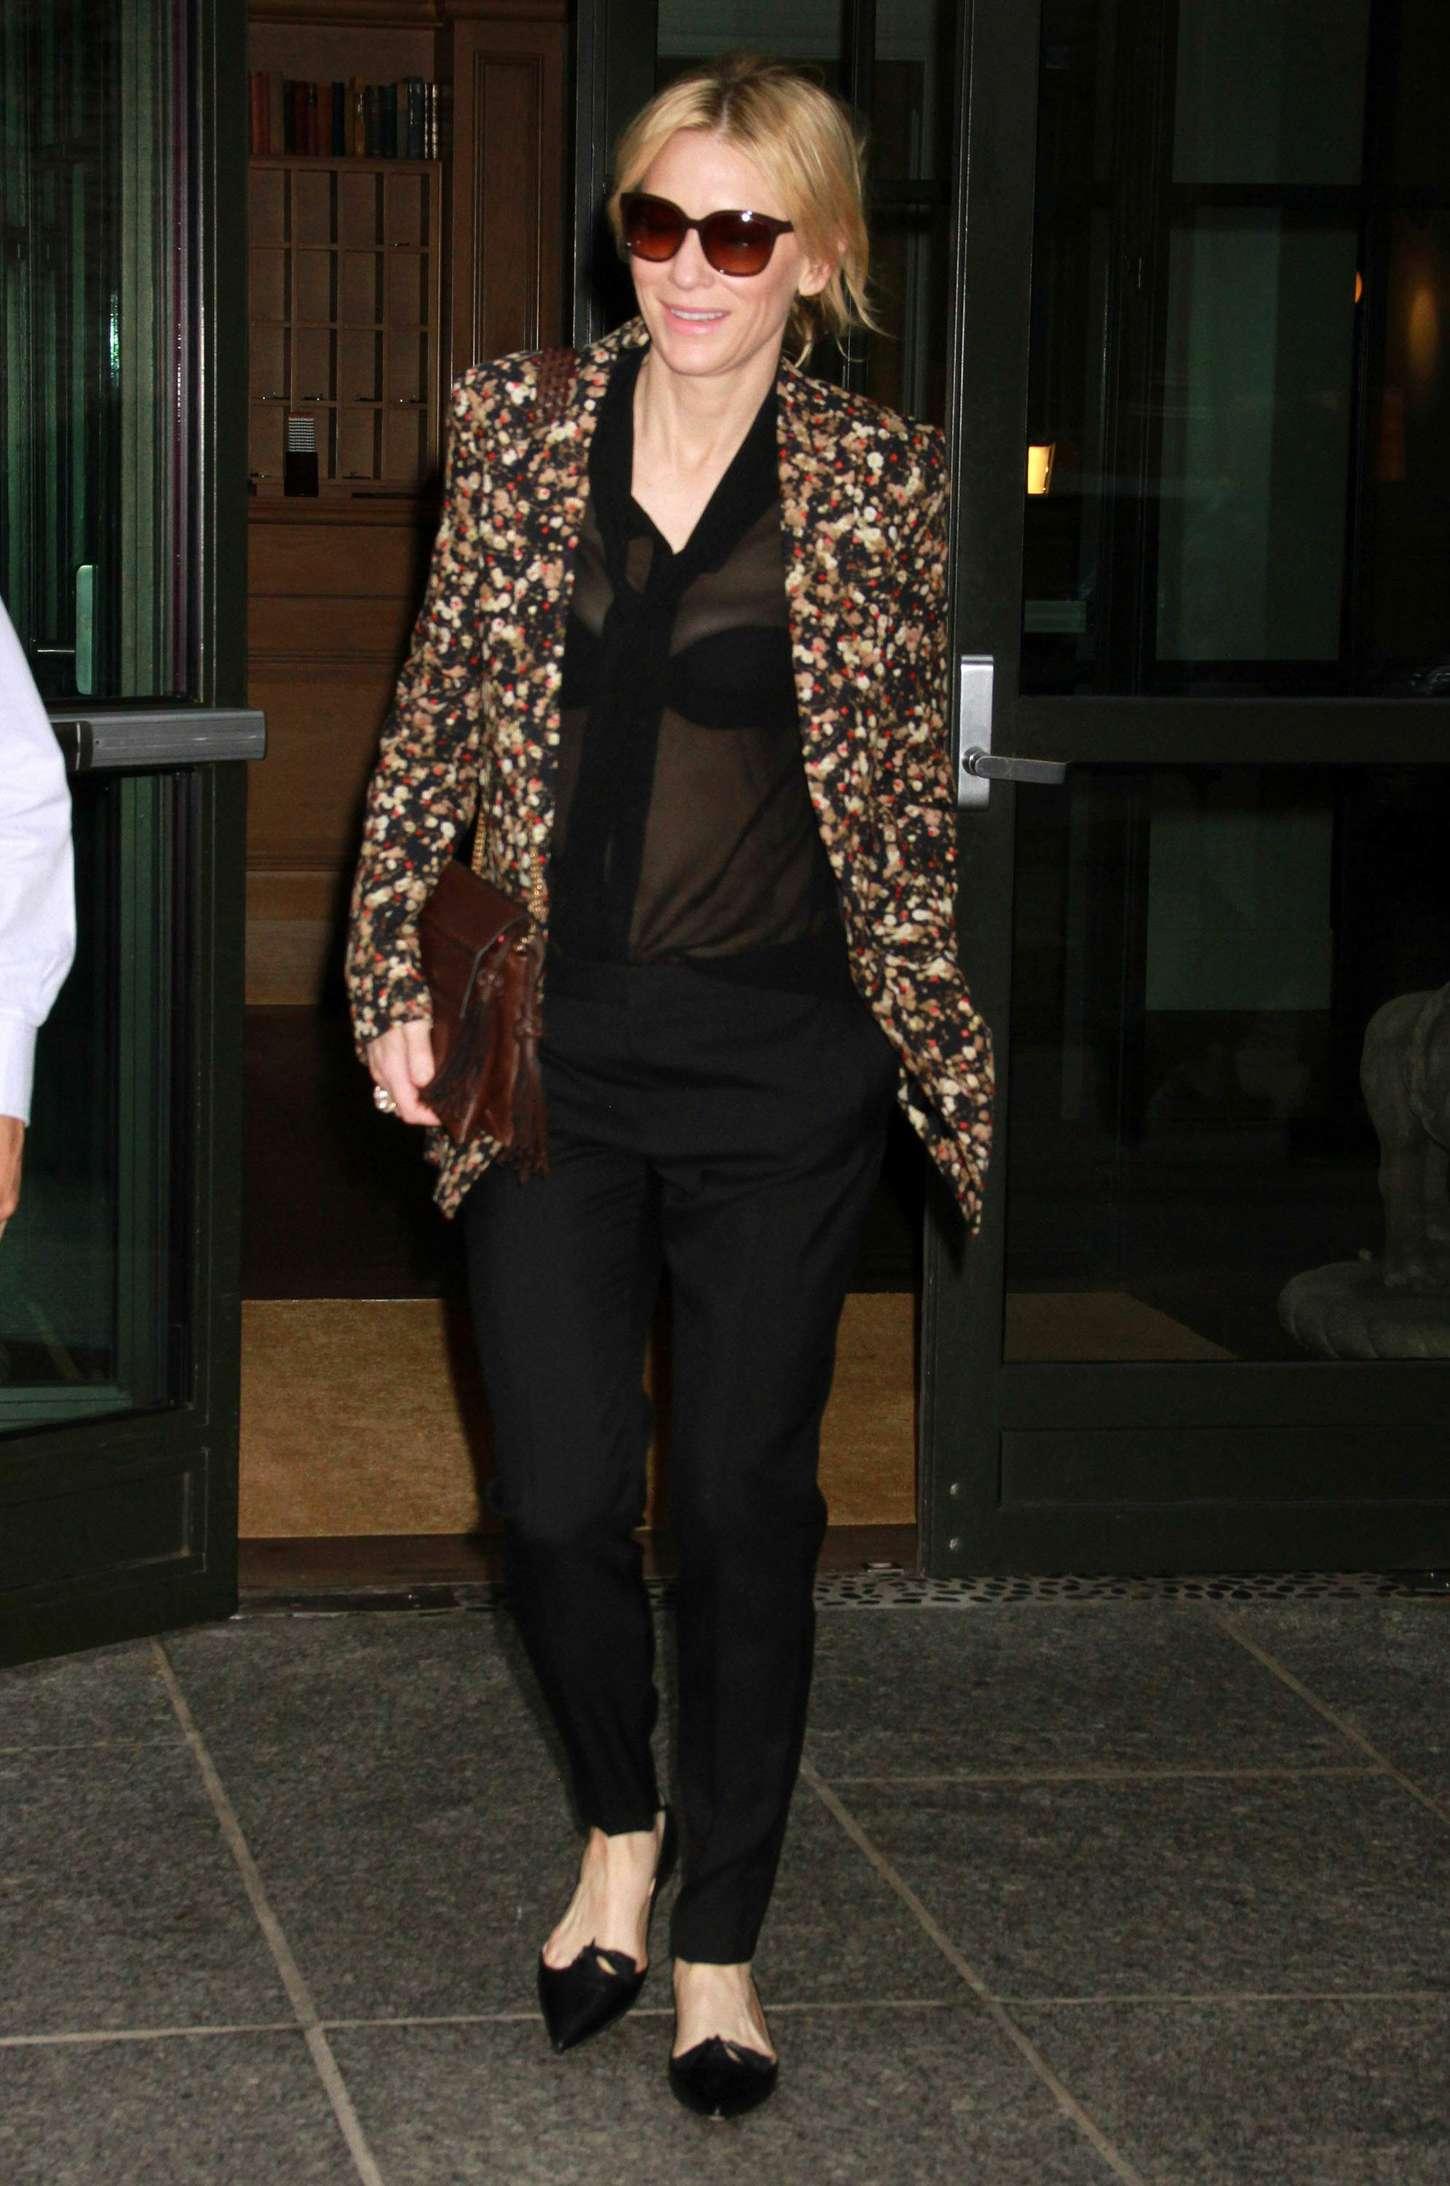 Cate Blanchett 2015 : Cate Blanchett out in New York City -08